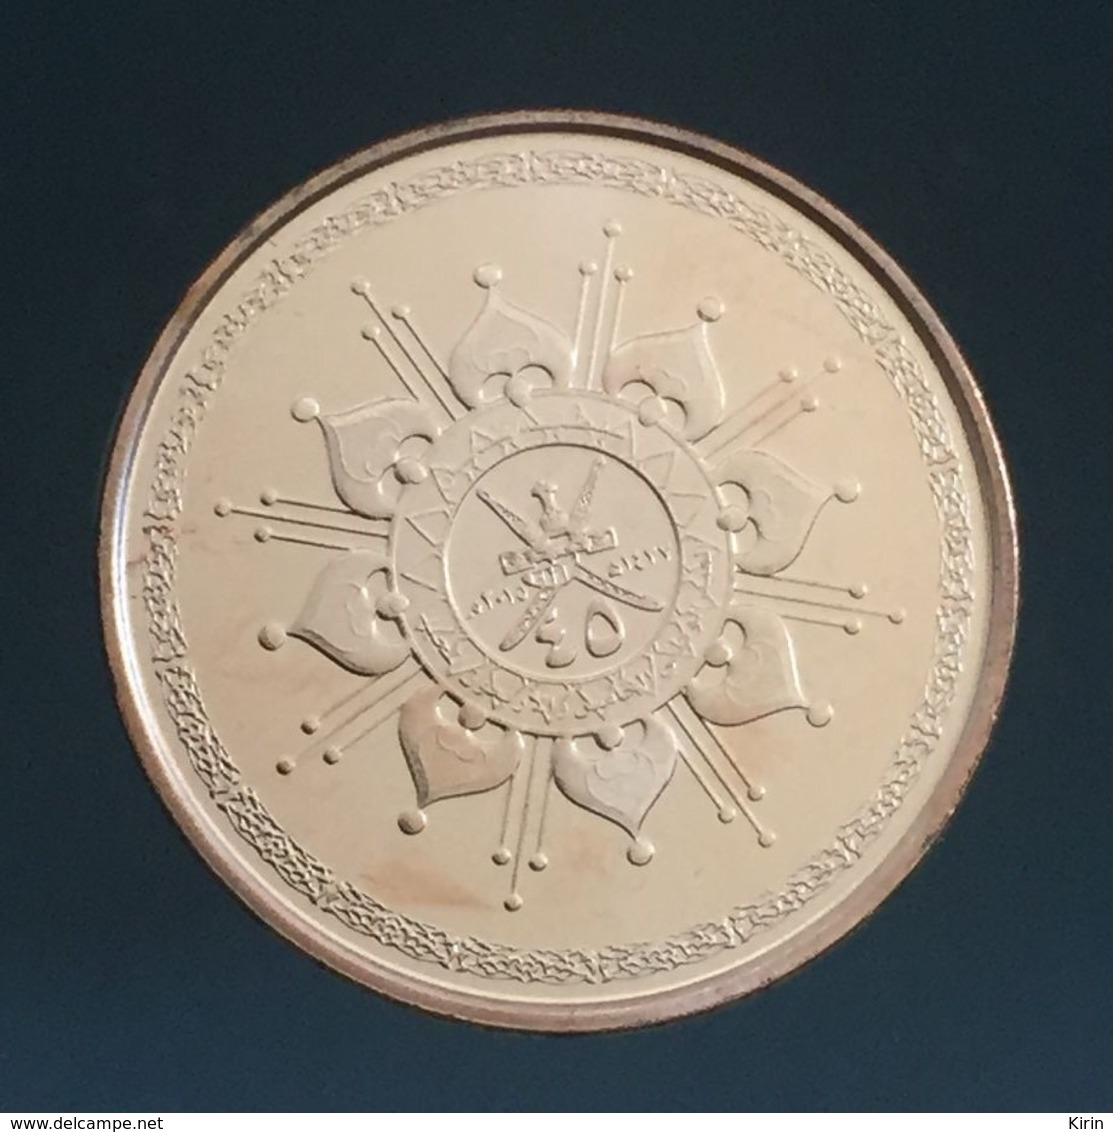 Oman 5 Baisa 2015 45th National Day Commemorative Coin UNC - Oman